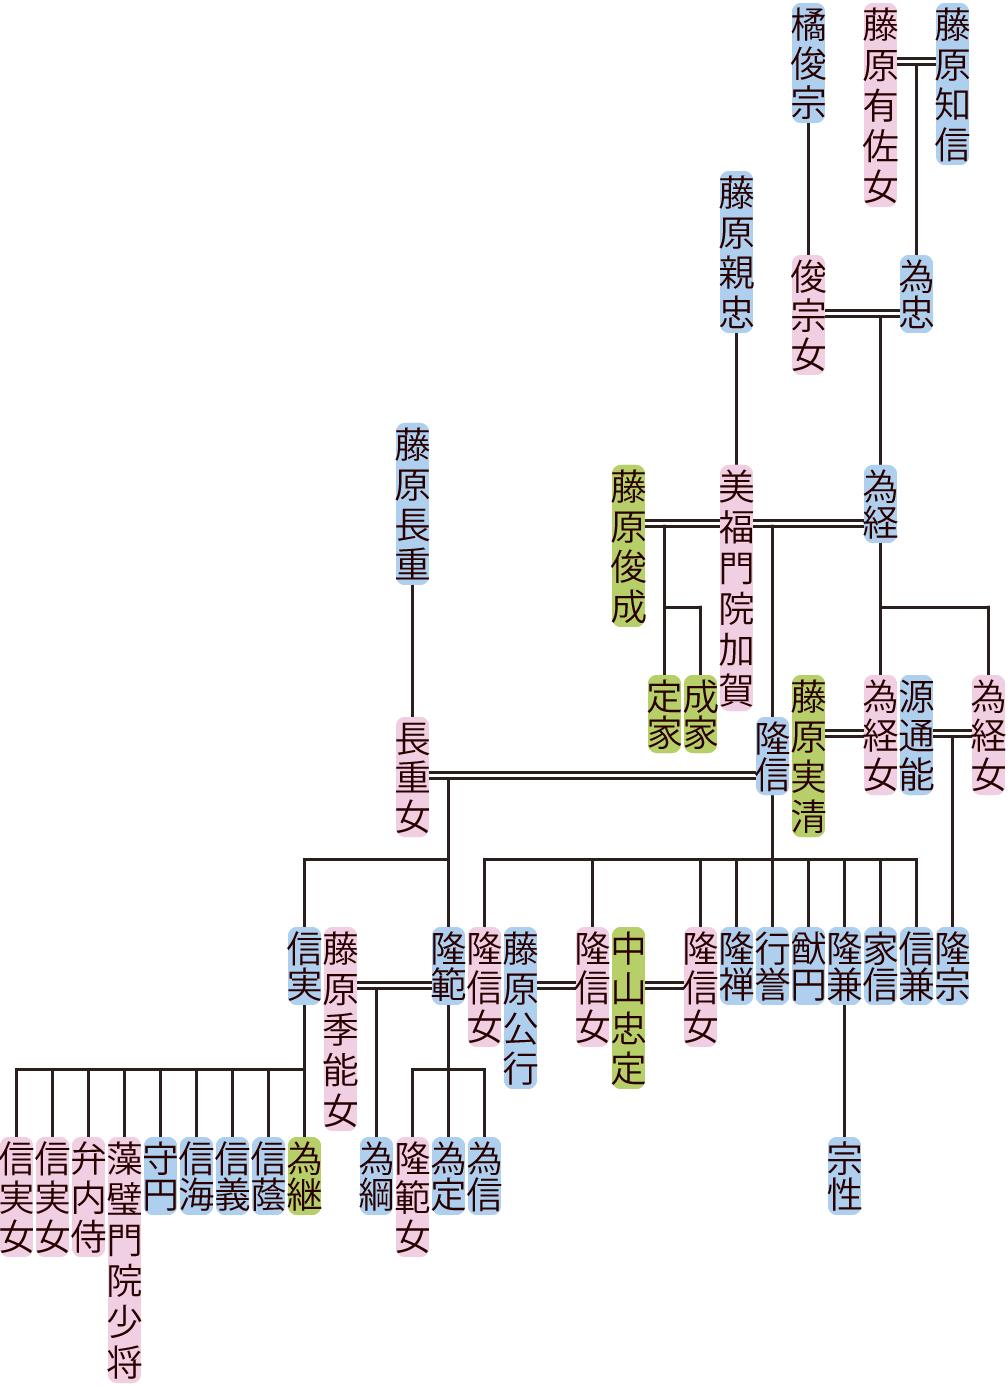 藤原為経・隆信の系図